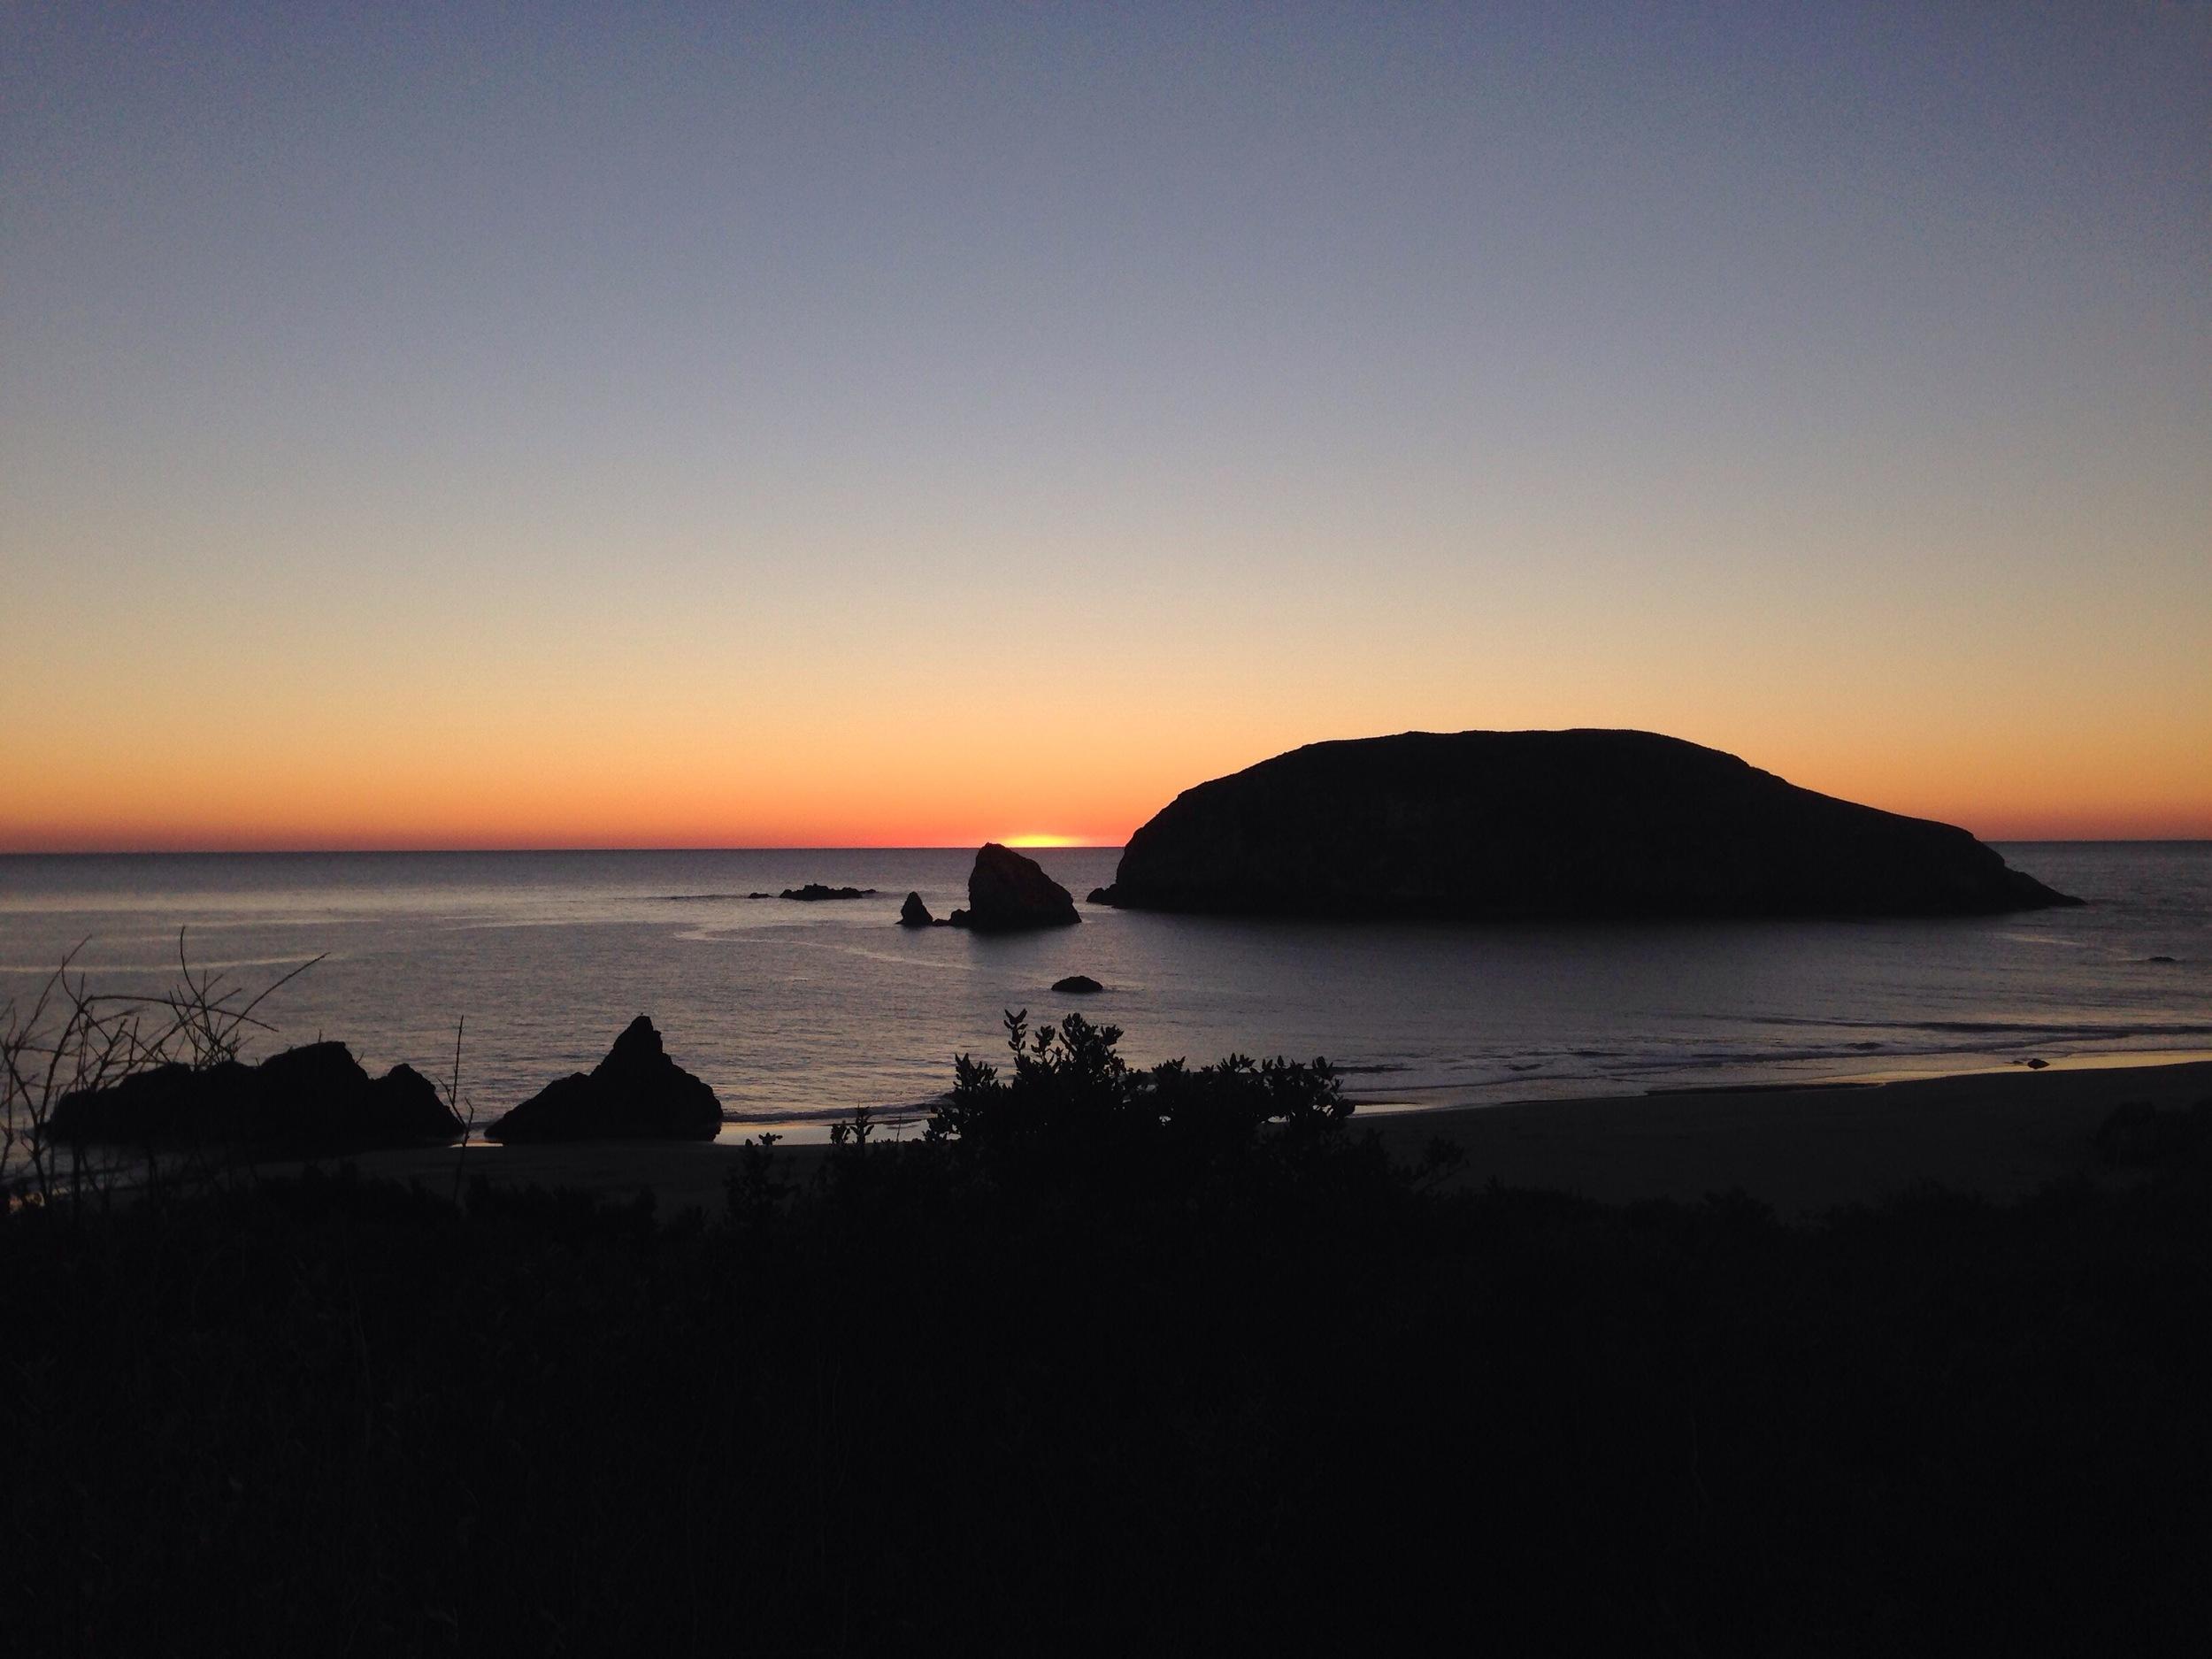 Sunset on the southern Oregon coast